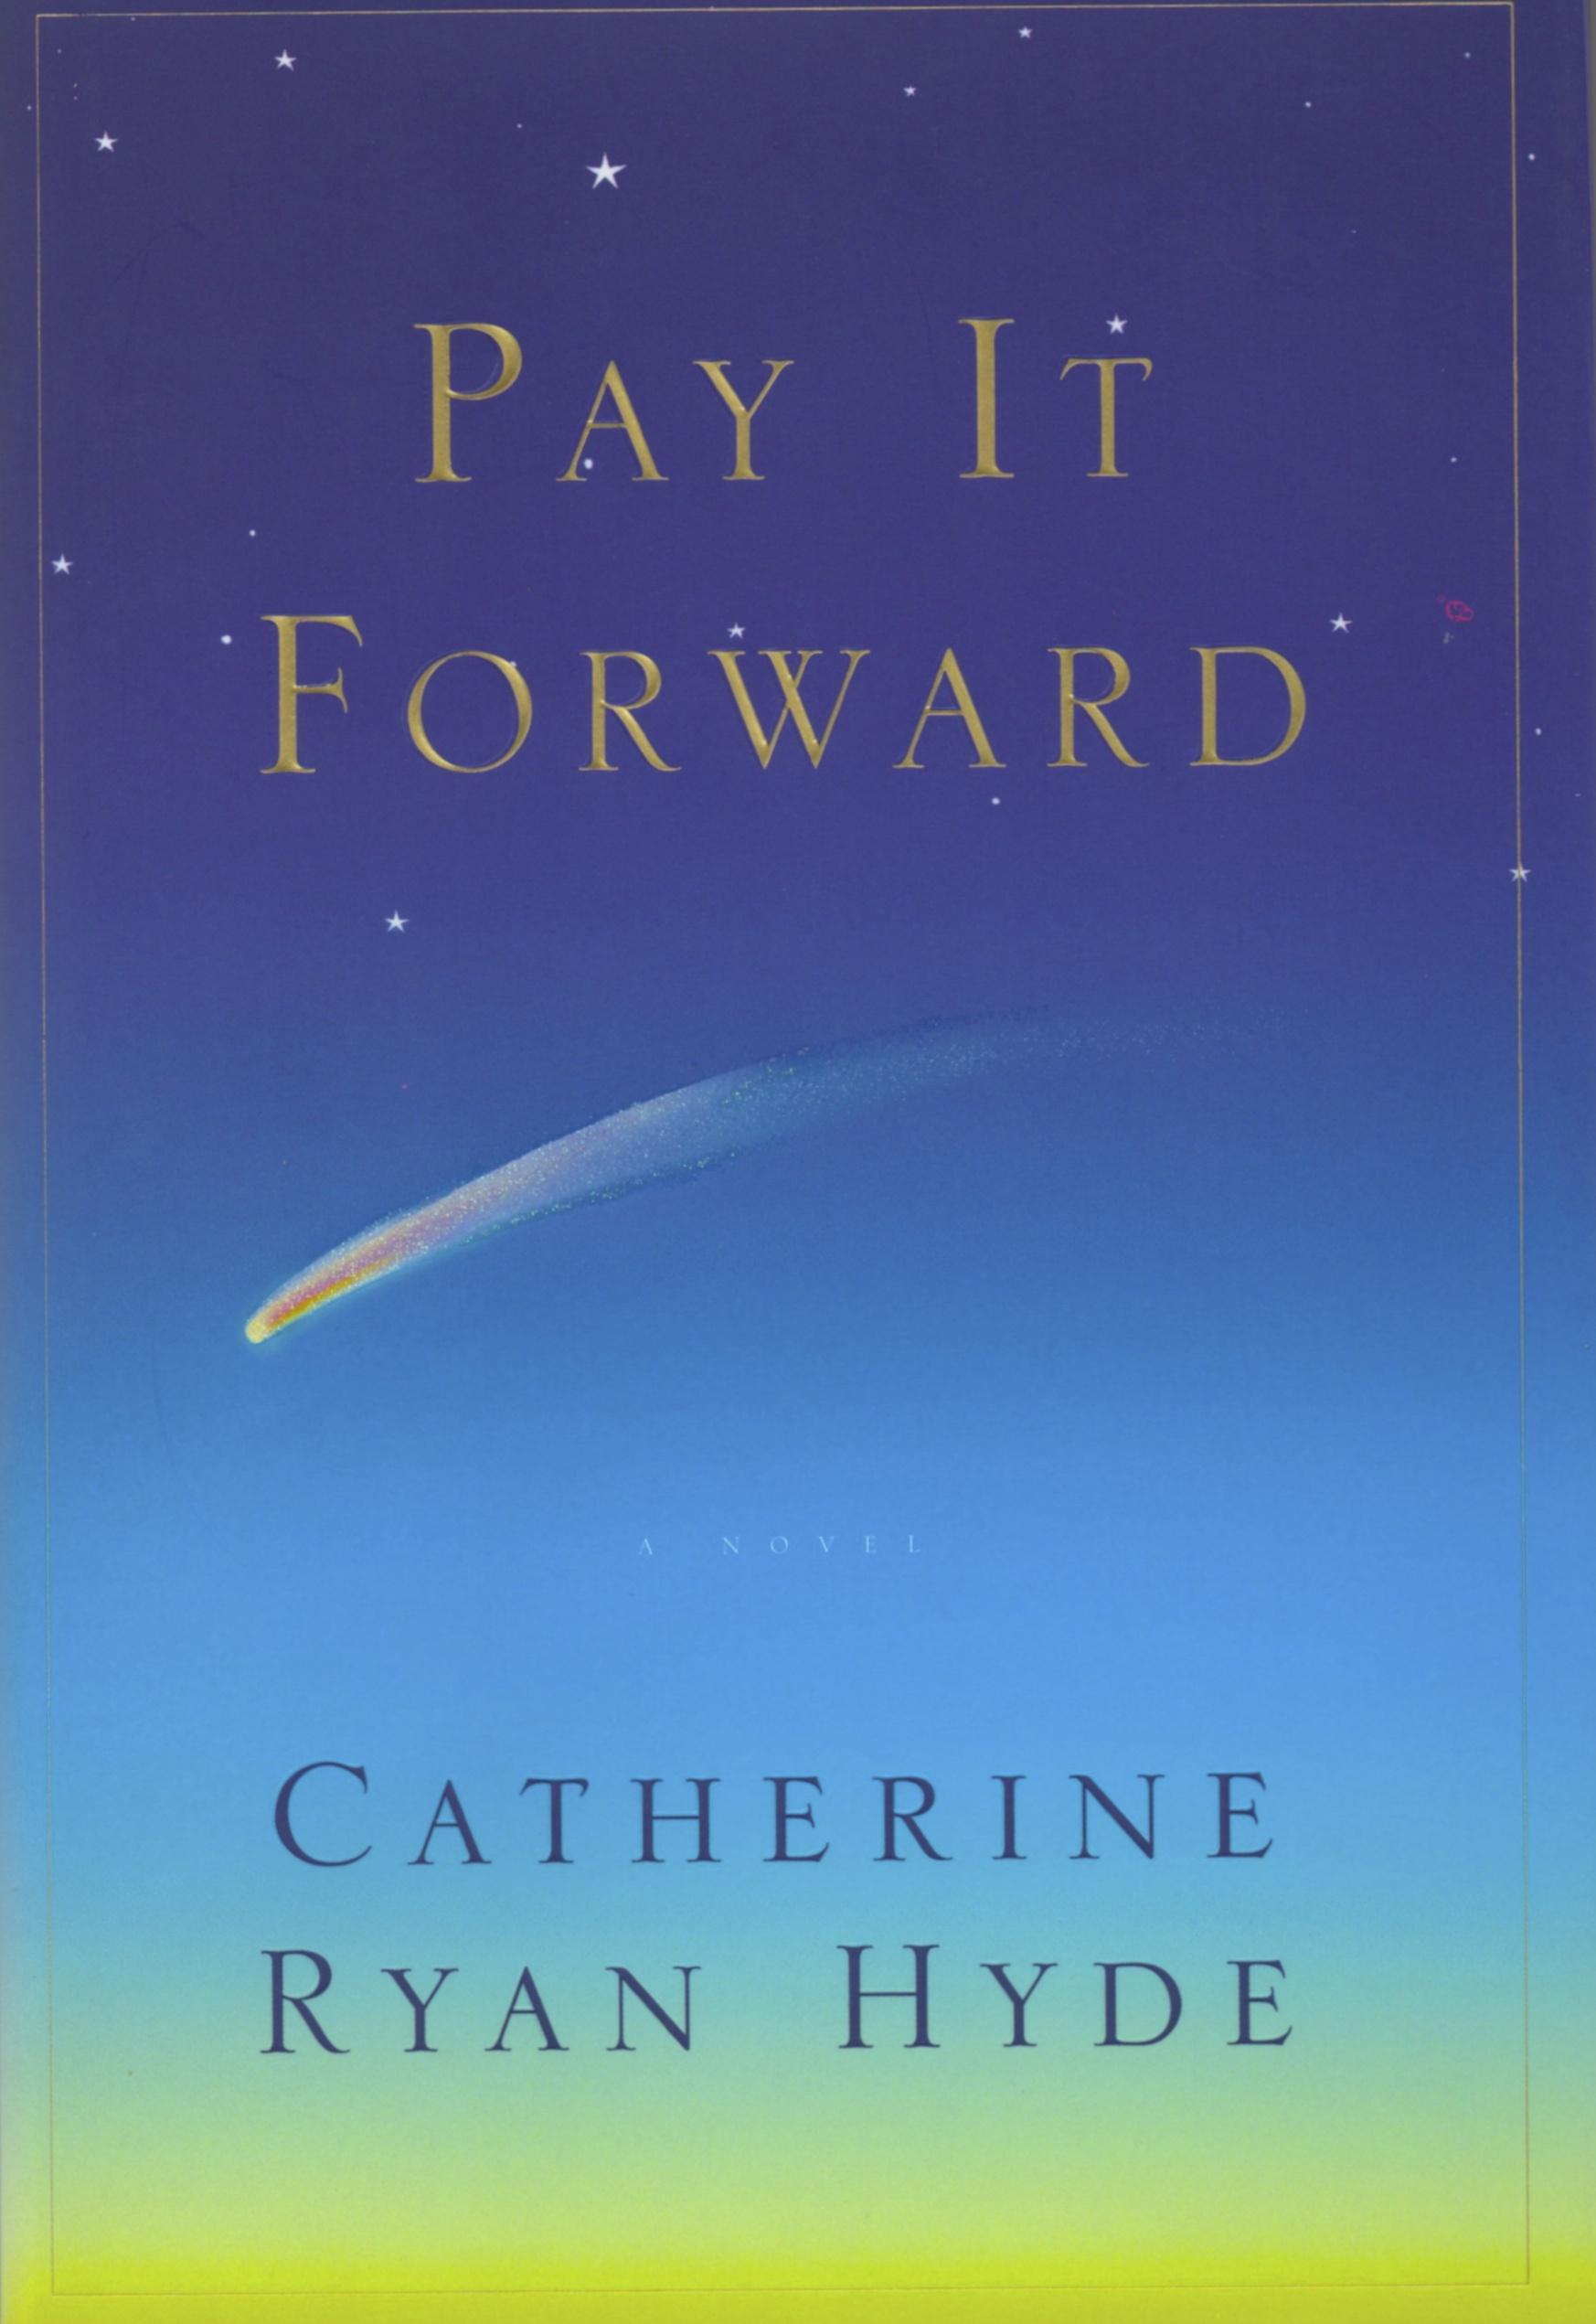 Pay It Forward — Catherine Ryan Hyde